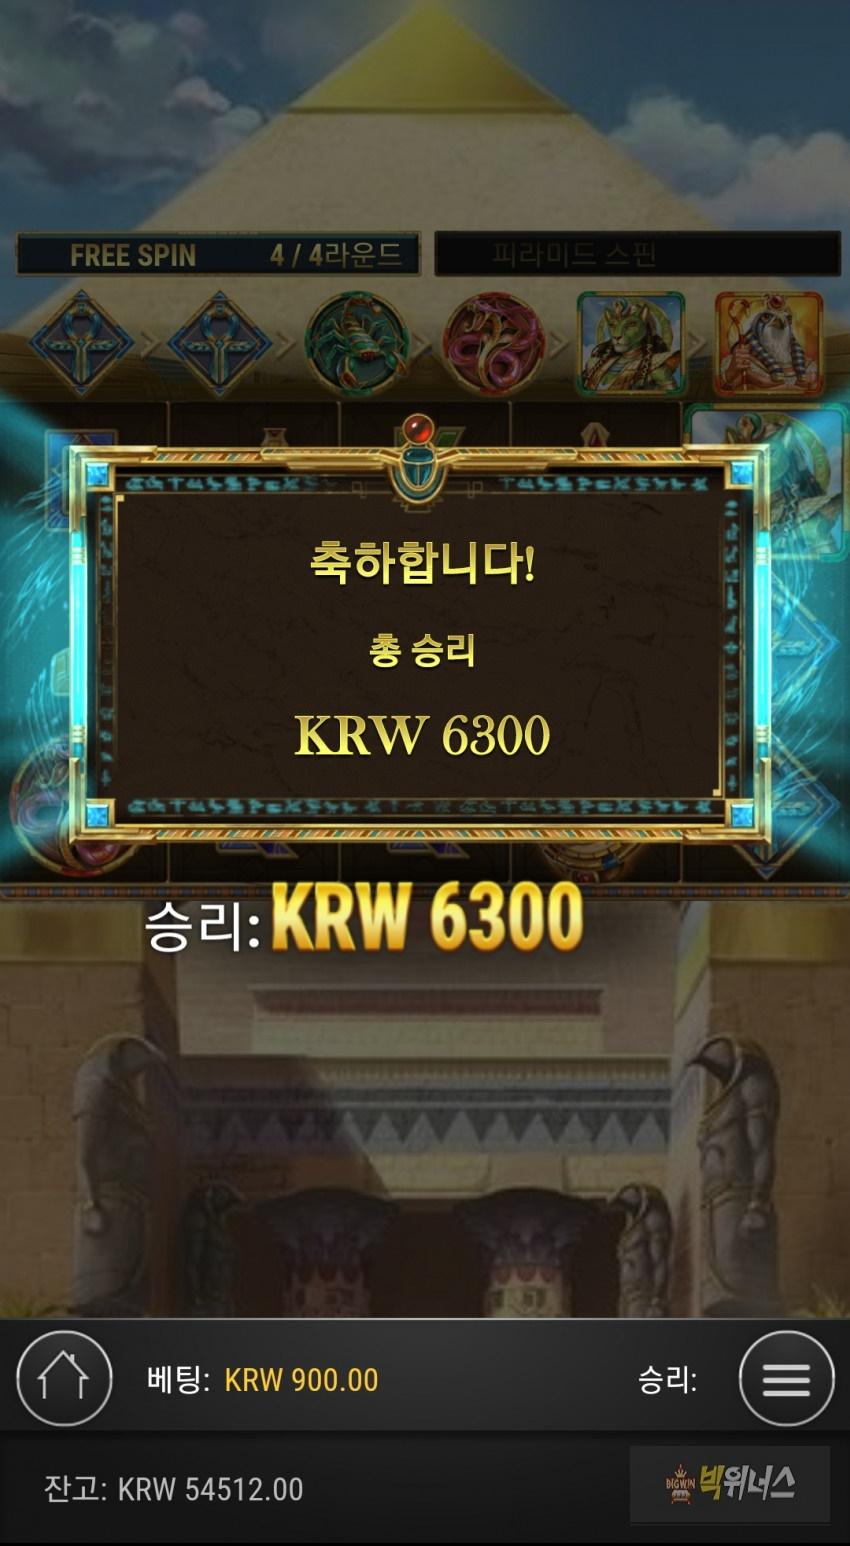 921f6e4d31eb0b22acbfa26a9dc7f5ca_1620940922_3575.jpg